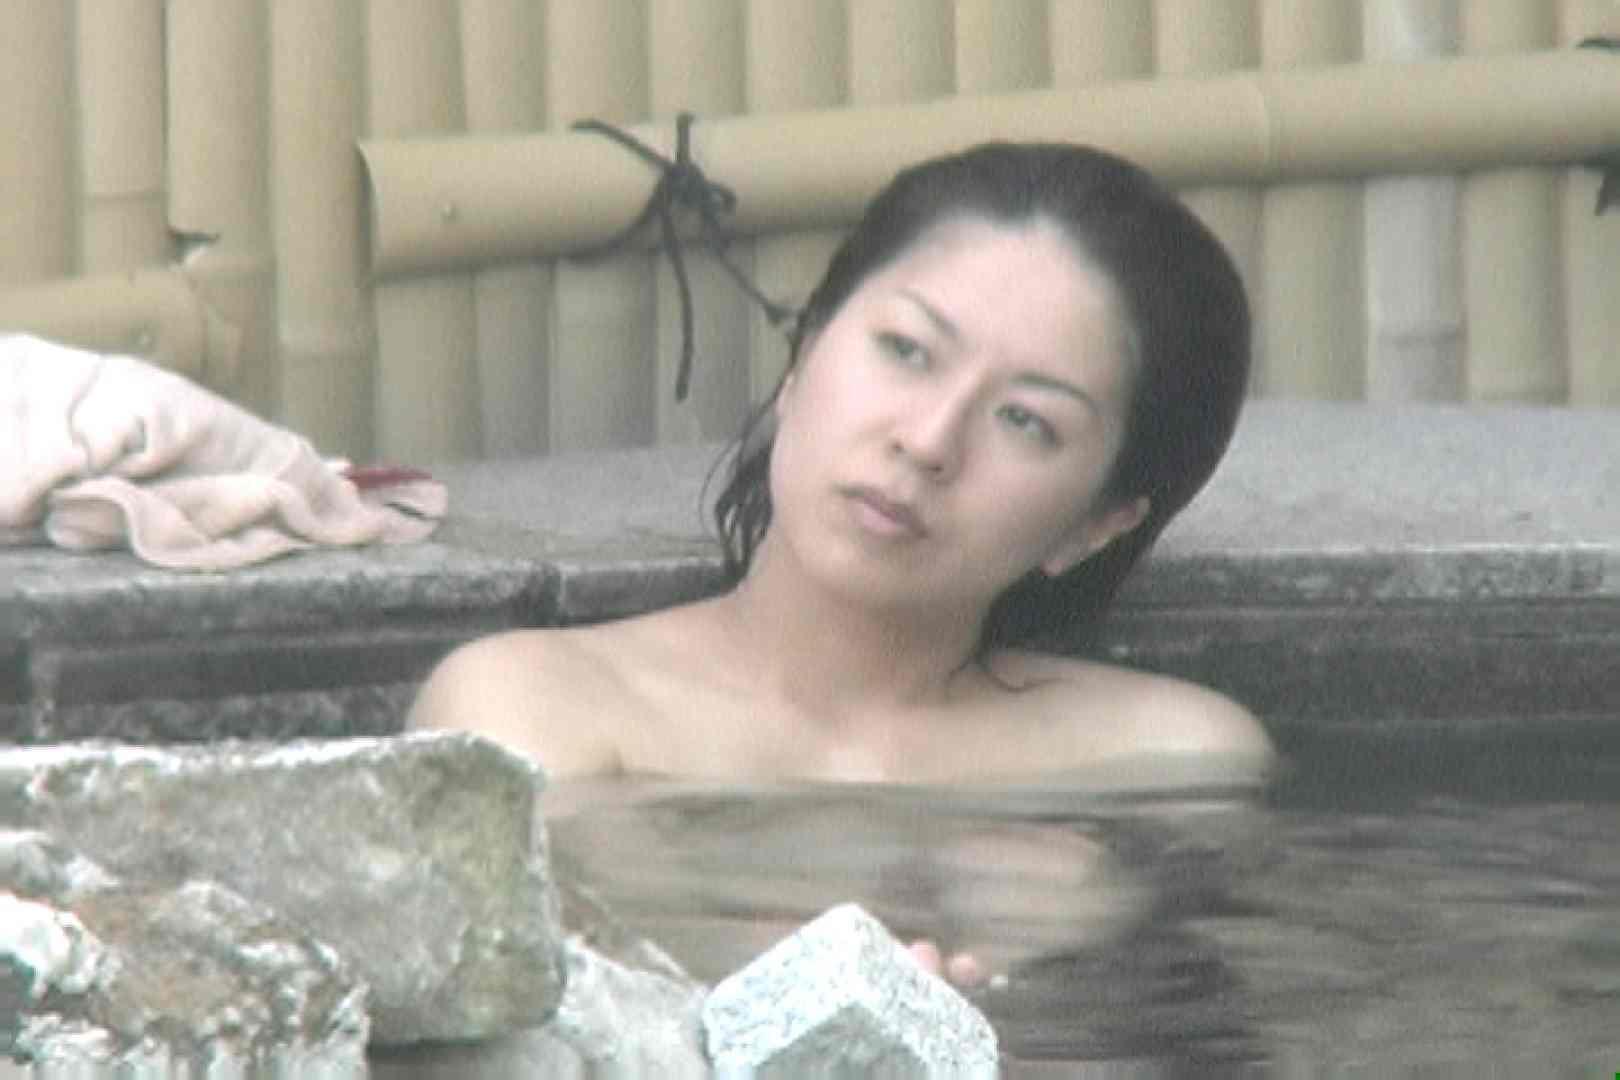 Aquaな露天風呂Vol.694 露天 オメコ無修正動画無料 110PICs 101